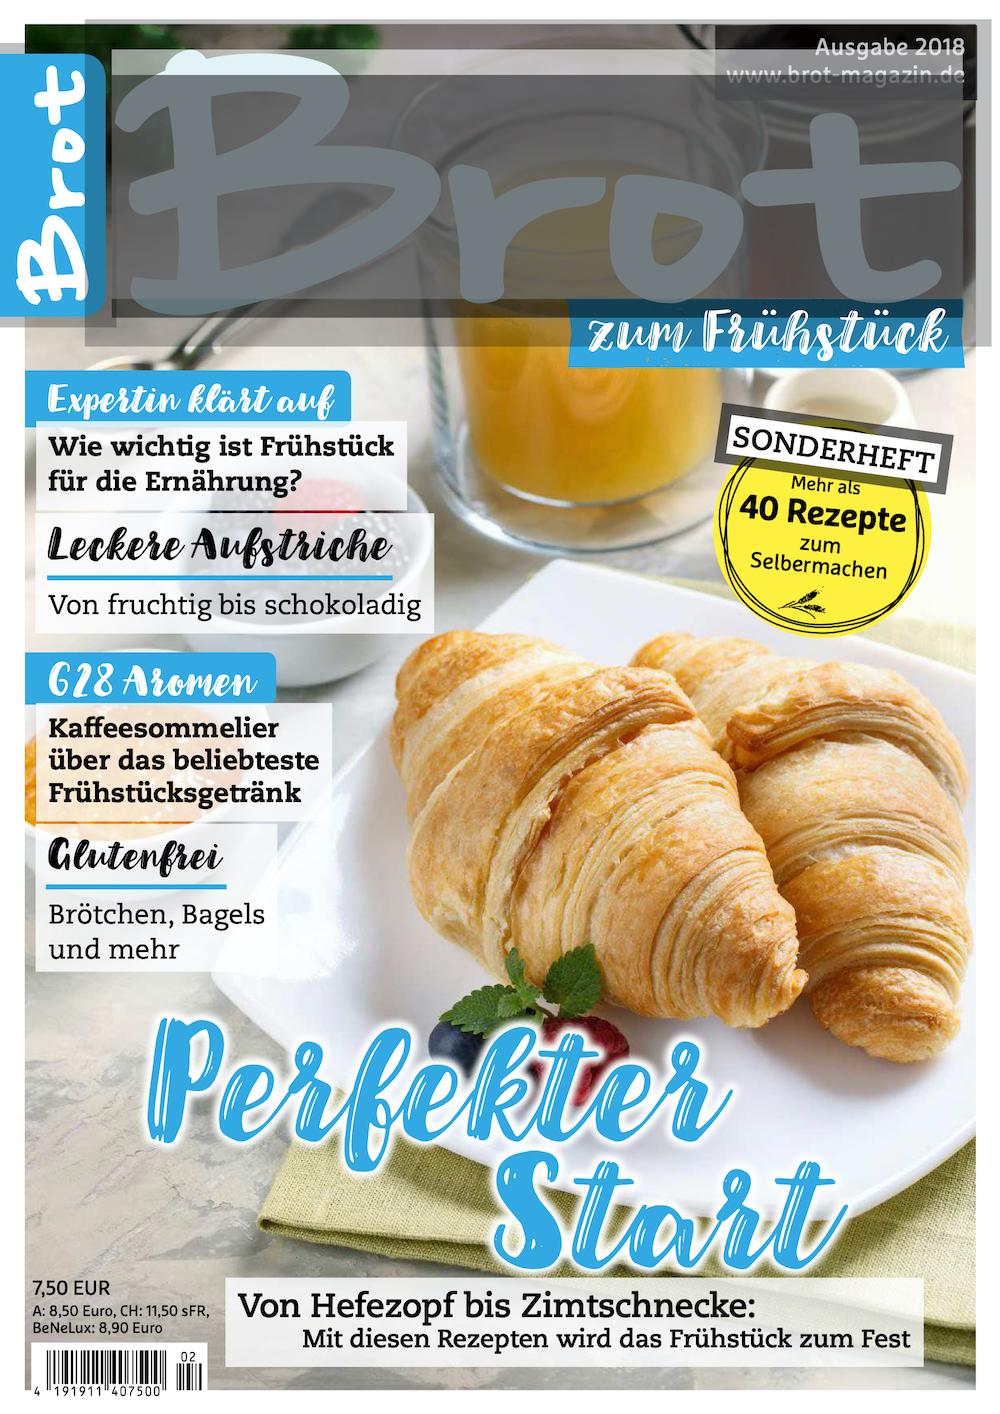 Brot Sonderheft zum Frühstück 2018